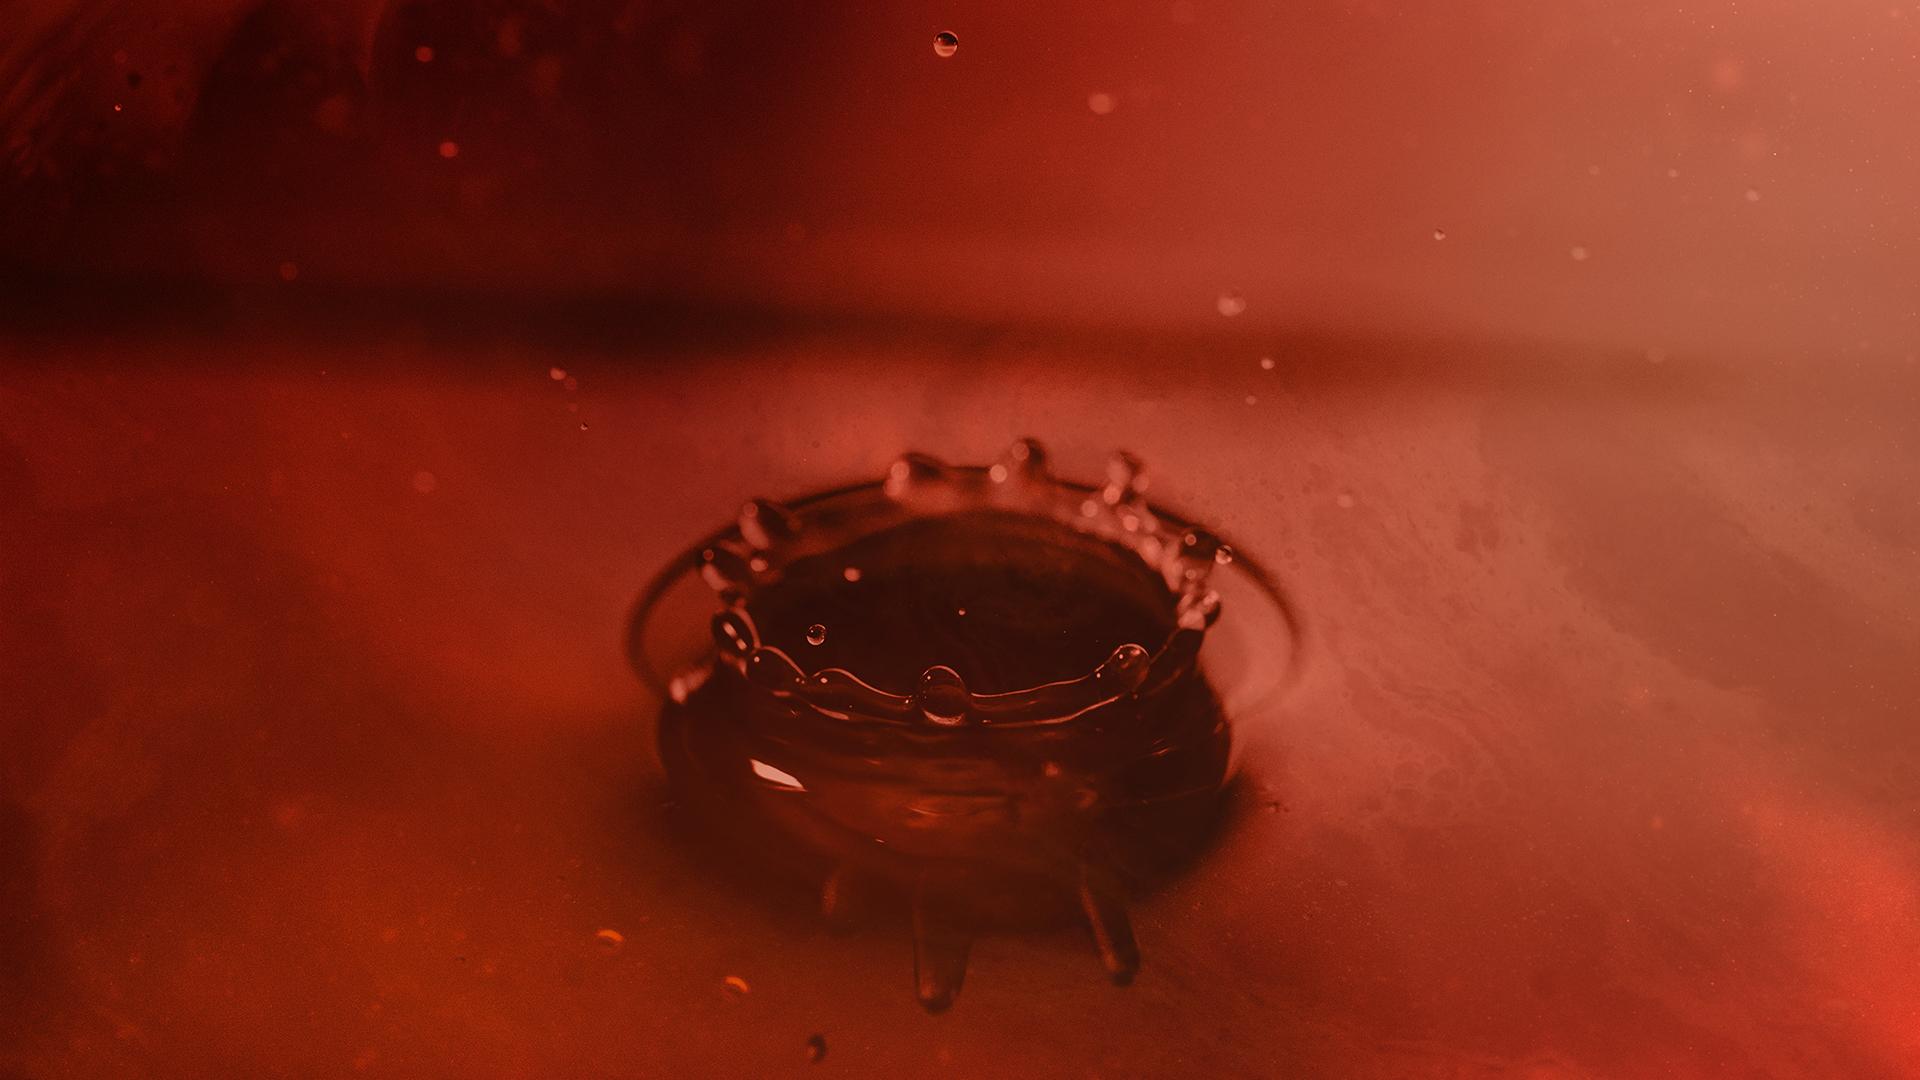 TERROR_S2_Concept01_01_Droplet